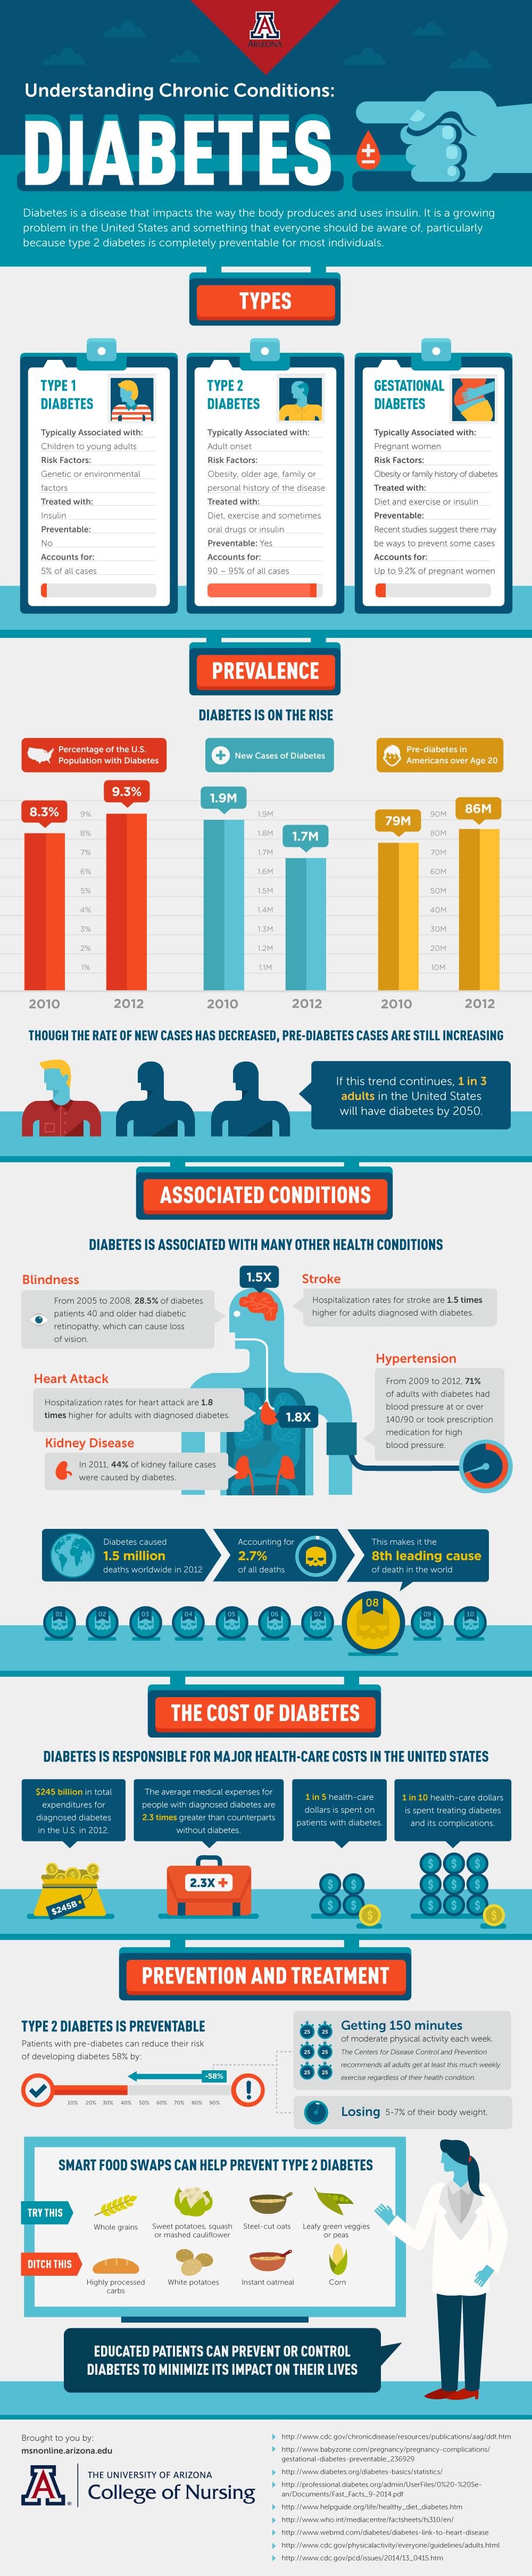 Diabetes Infographic - Run DMT